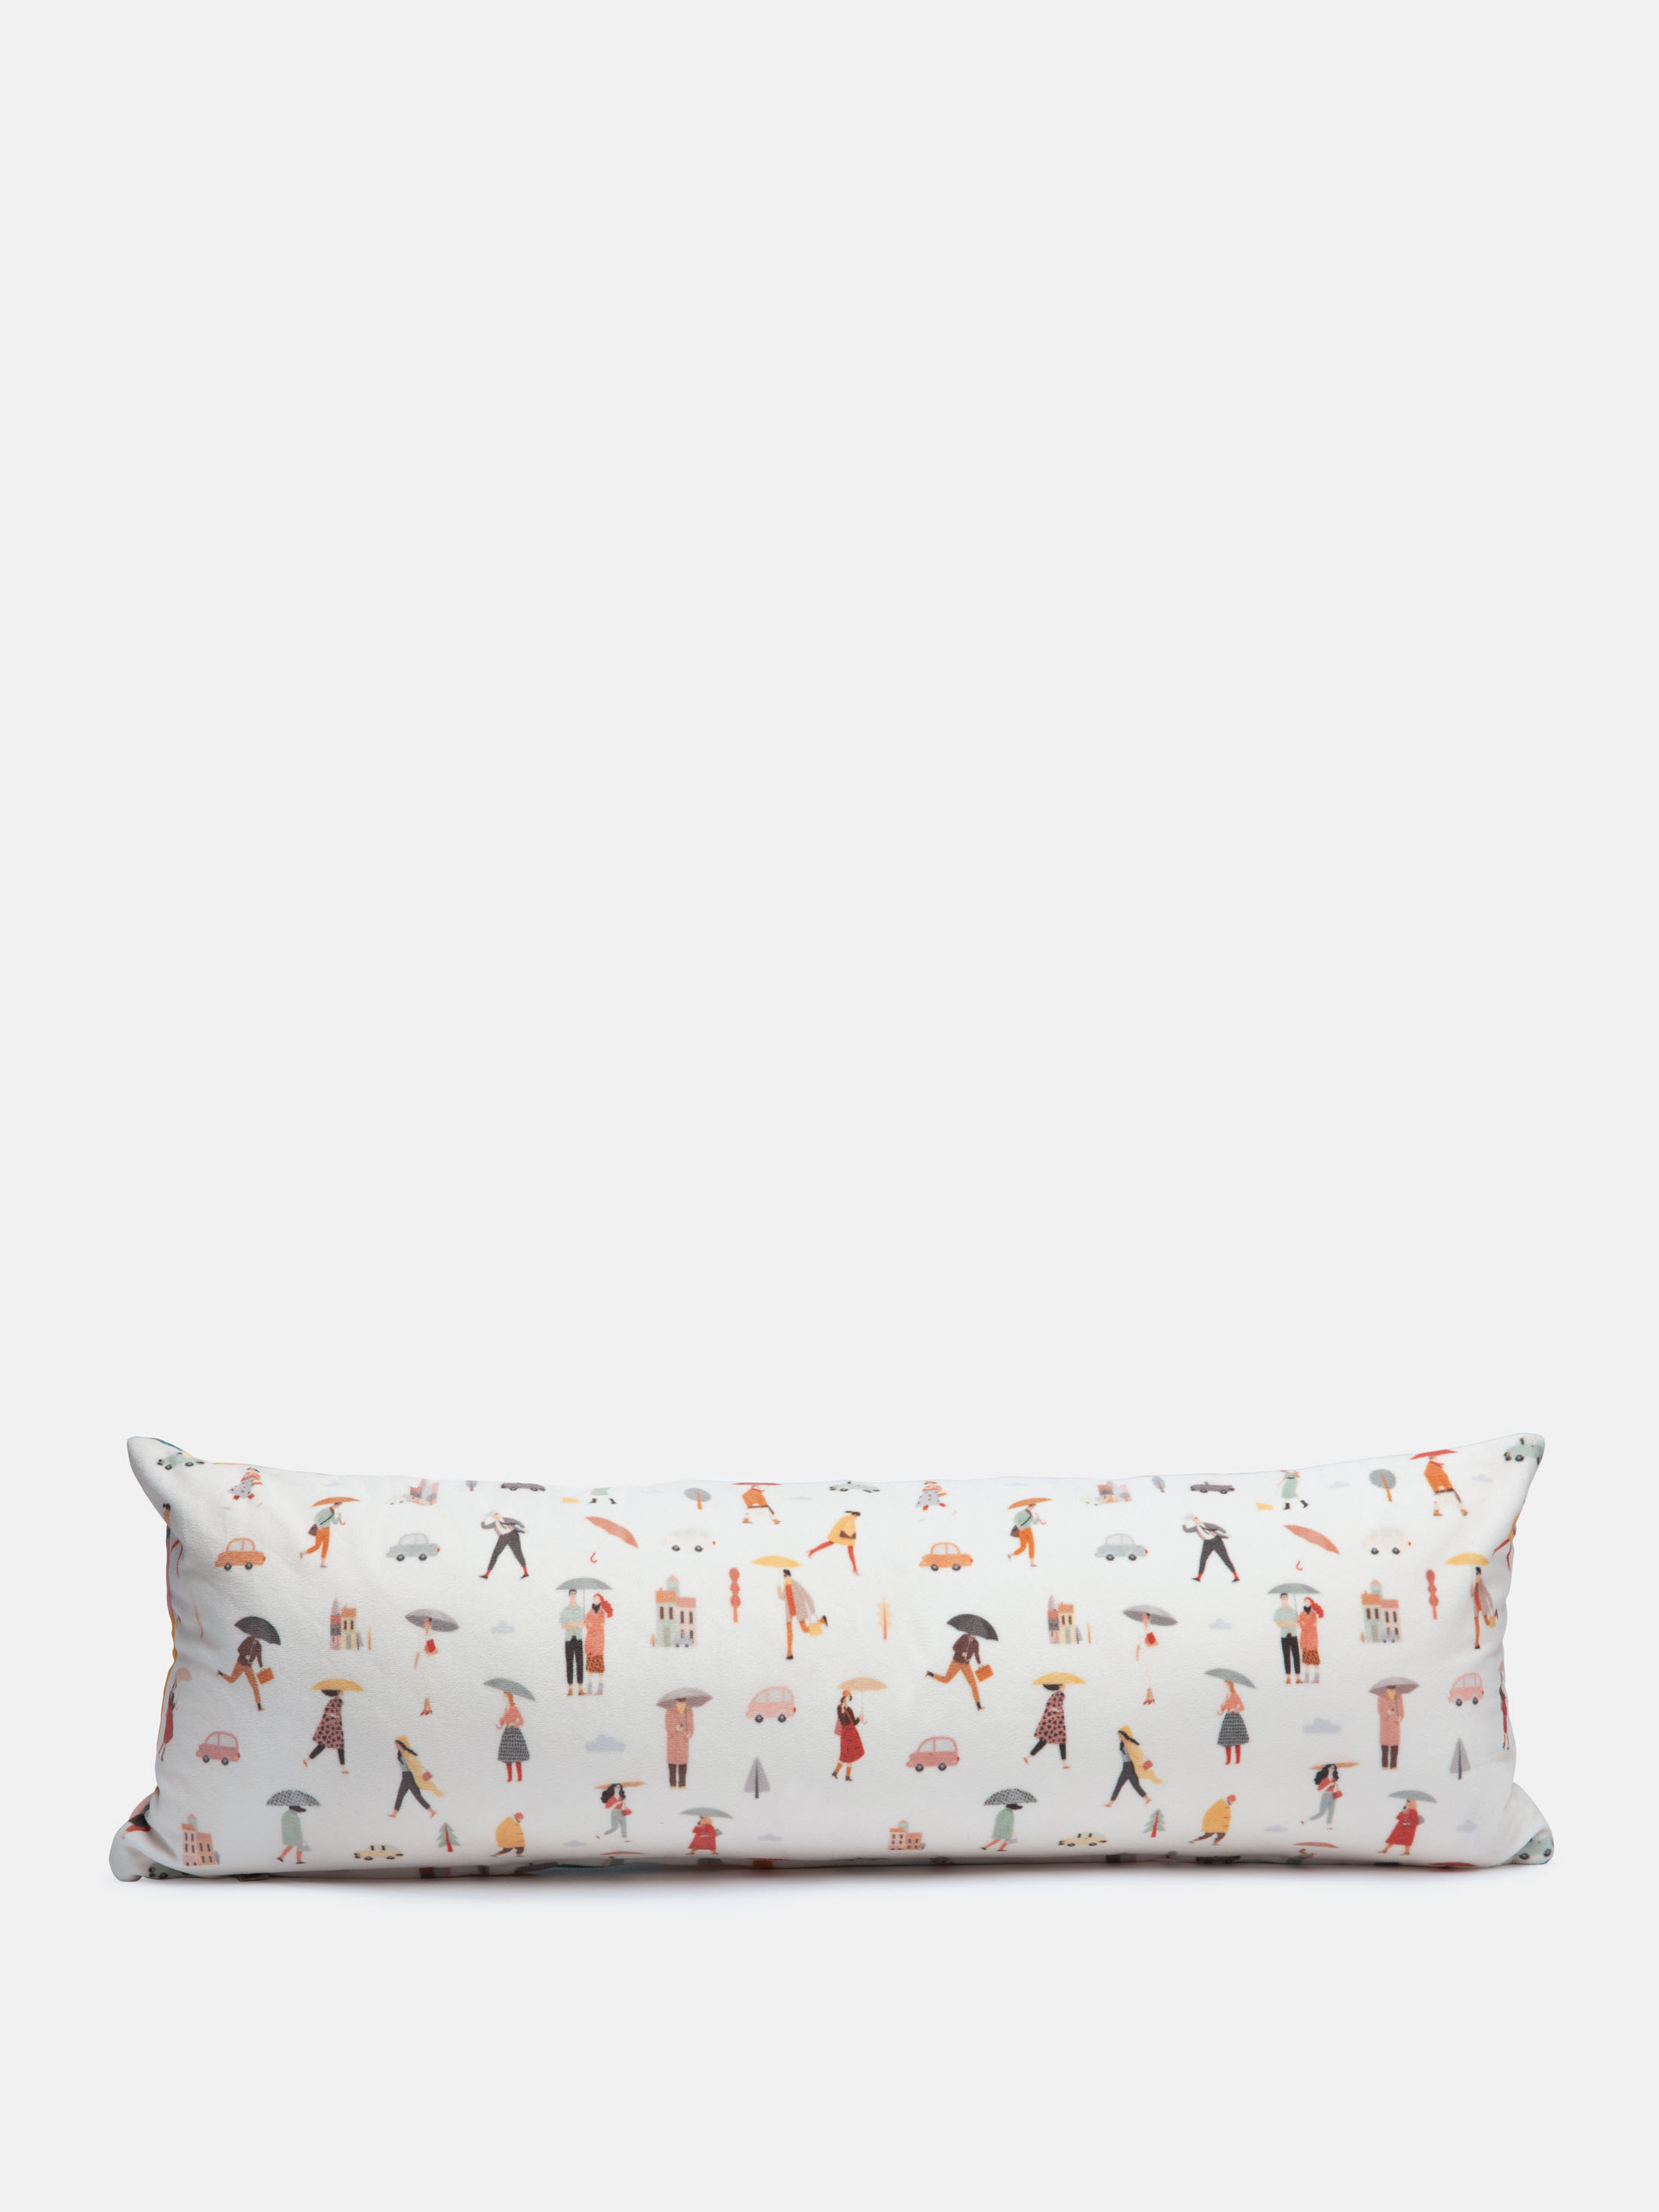 design your own body pillow custom body pillow printing